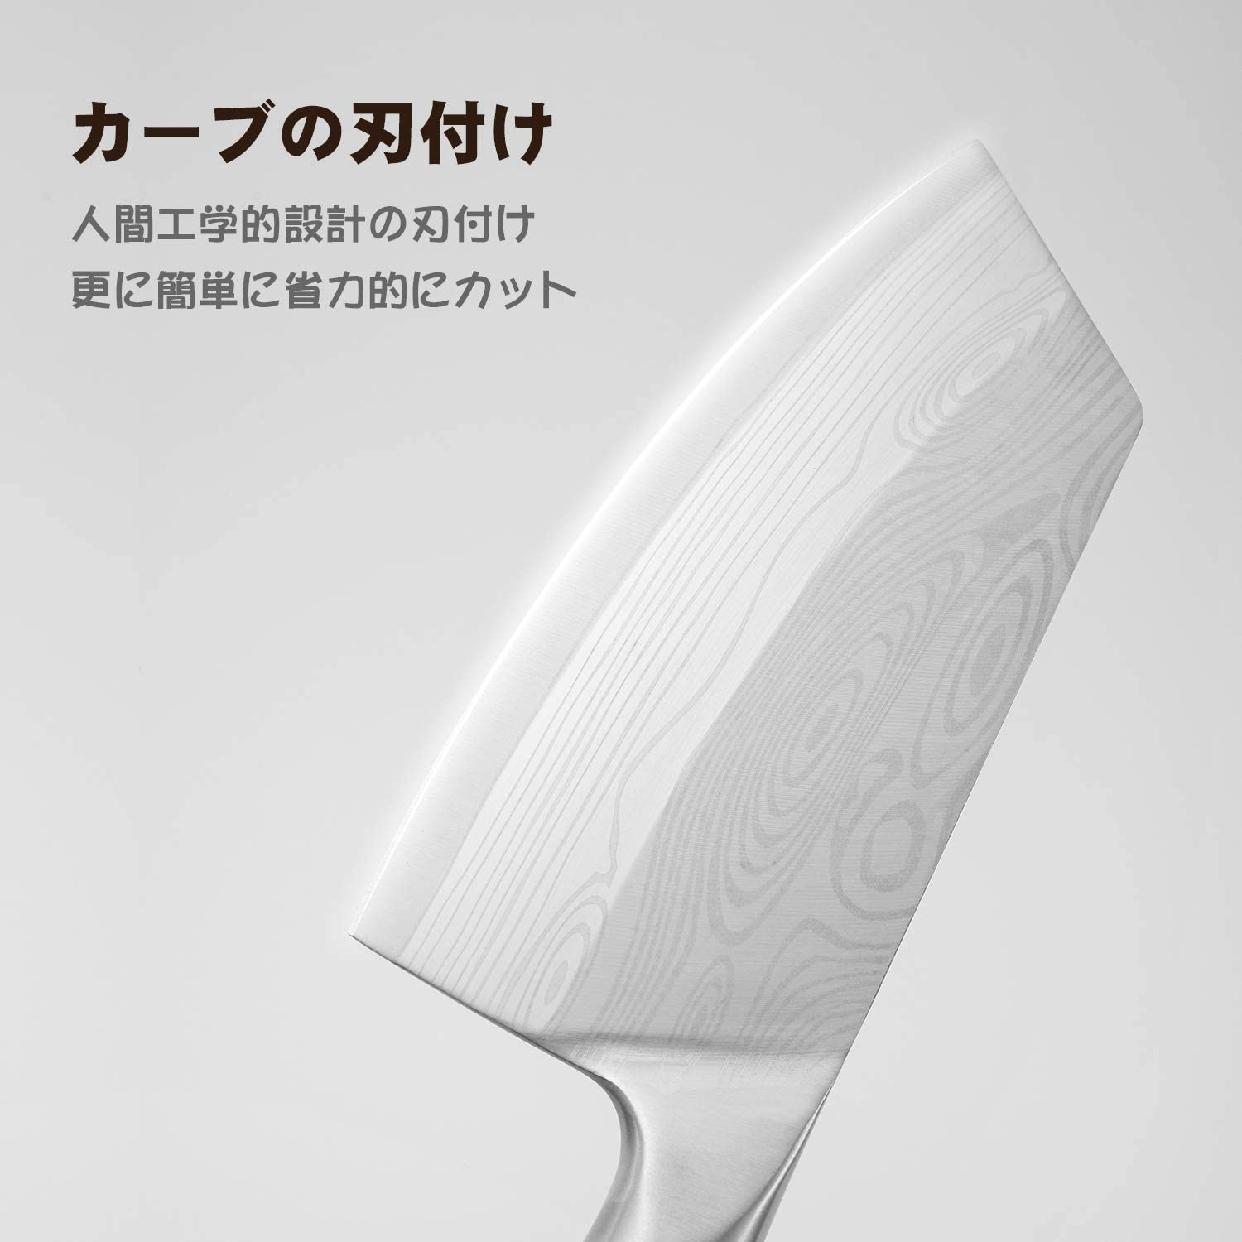 MUKAI(ムカイ) ステンレス キッチンナイフ 20cmの商品画像6